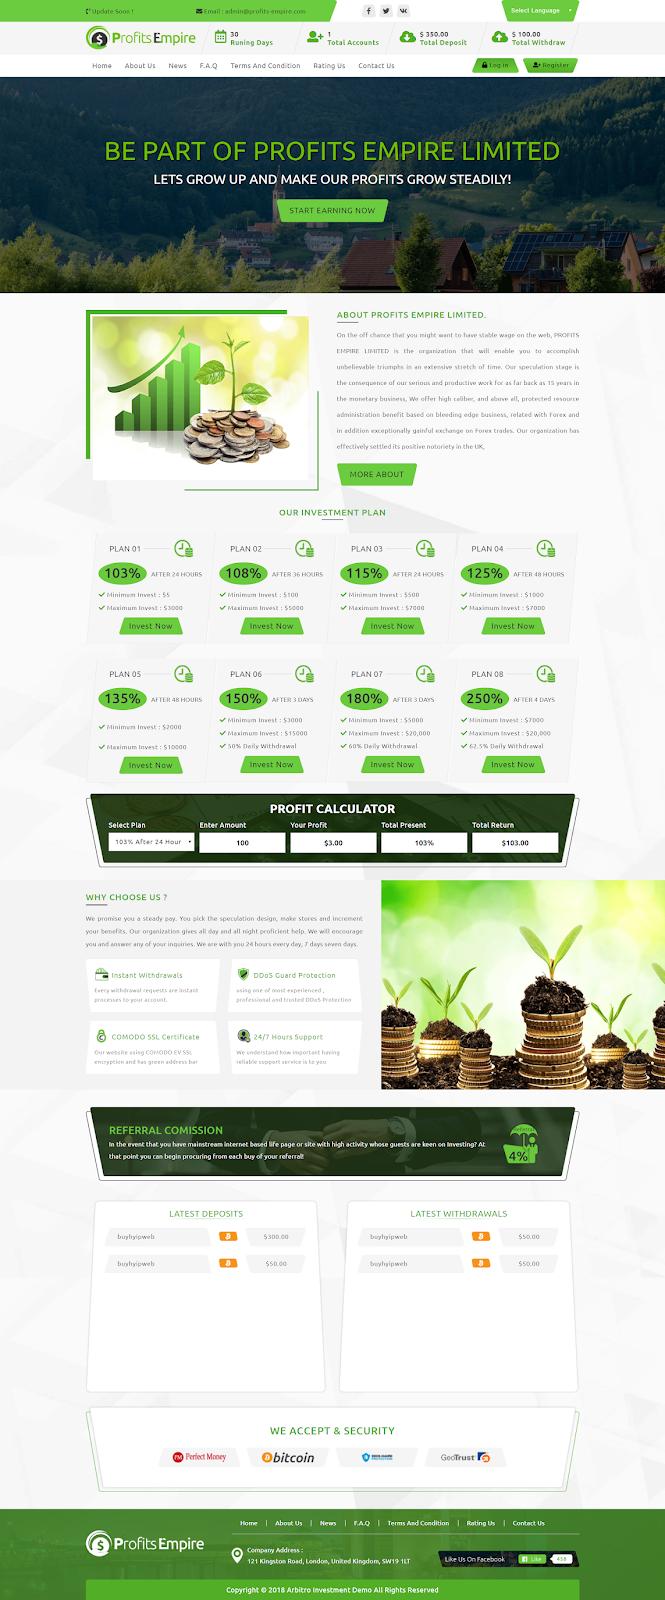 Profits empire Hyip Website Design By BHW